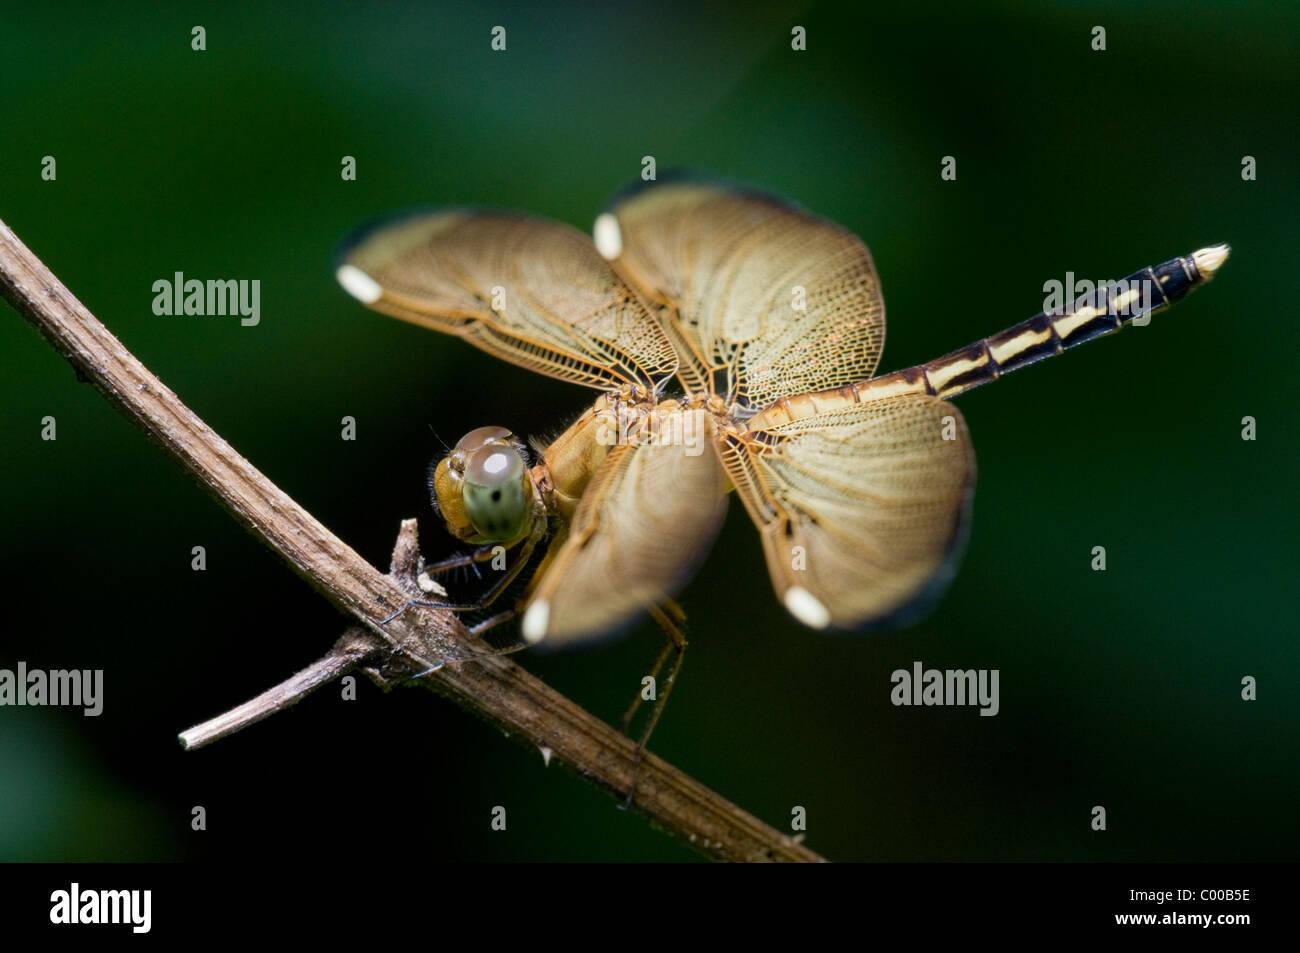 Libelle, Odonata, Dragonfly, Sulawesi, Indonesien, Indonesia - Stock Image